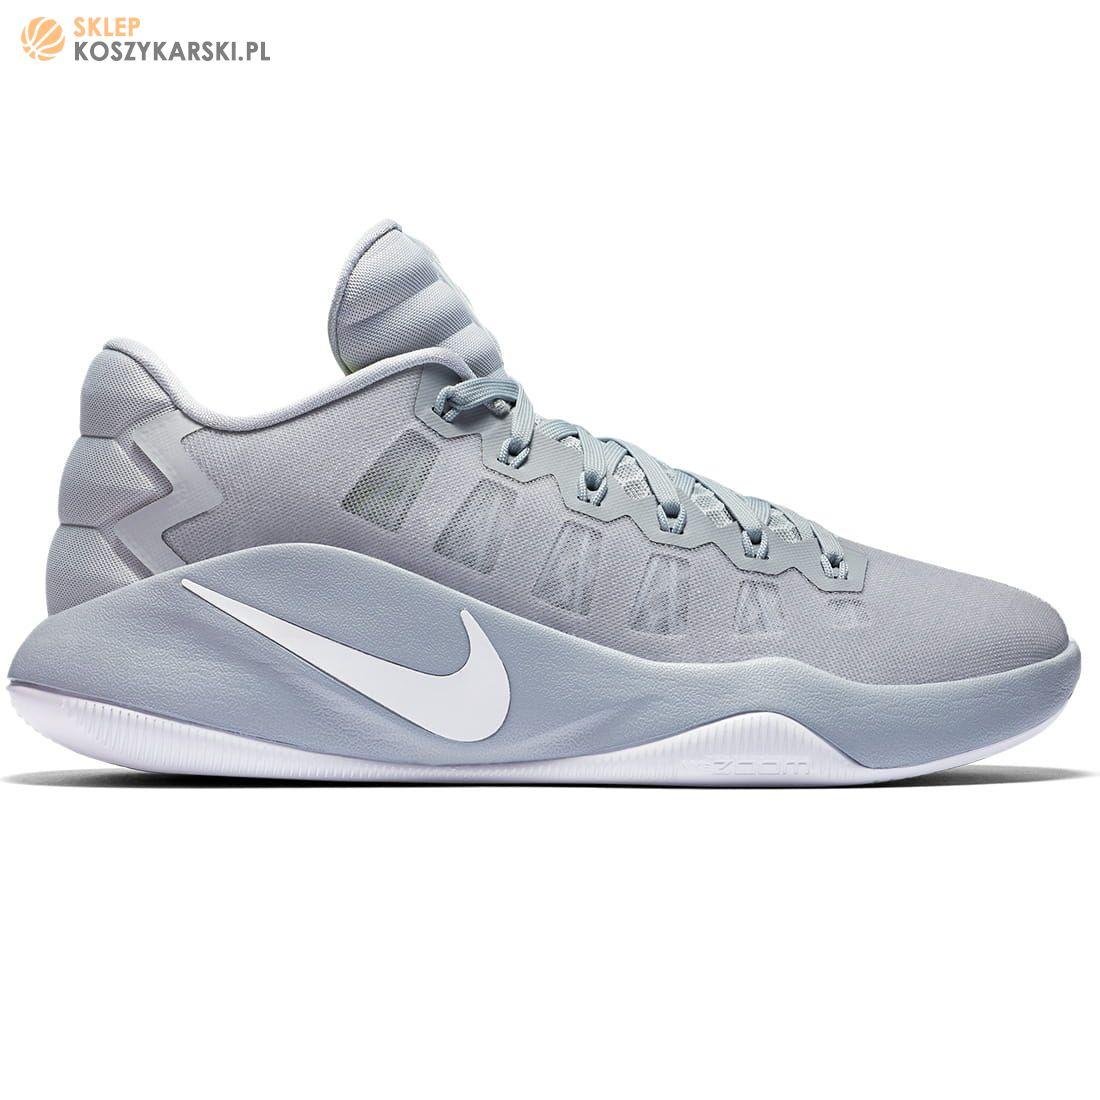 Buty Do Koszykowki Nike Hyperdunk 2016 844359 313 Sklepkoszykarski Pl